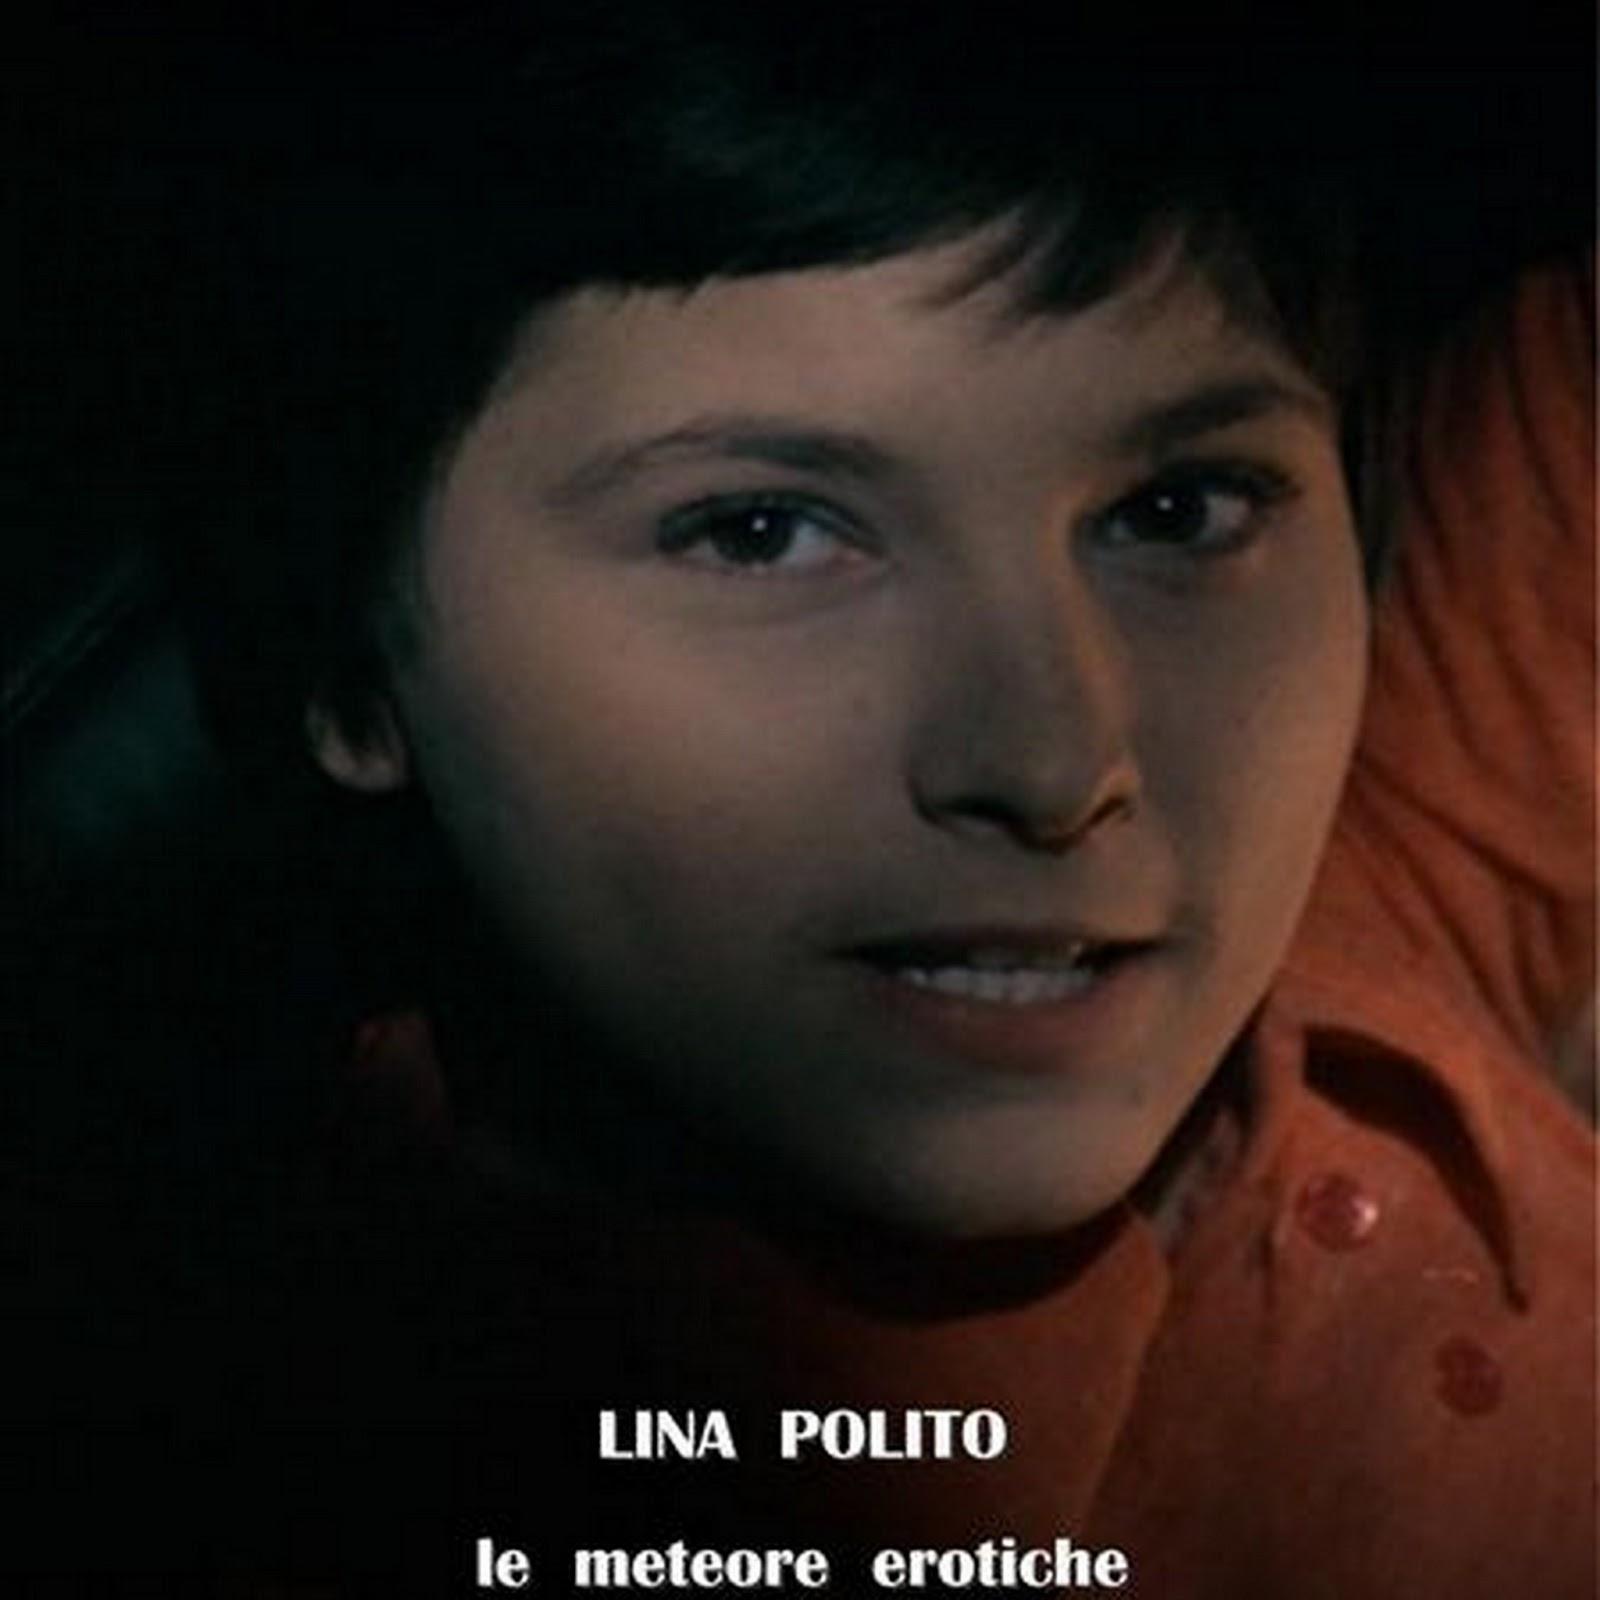 Watch Lina Polito video